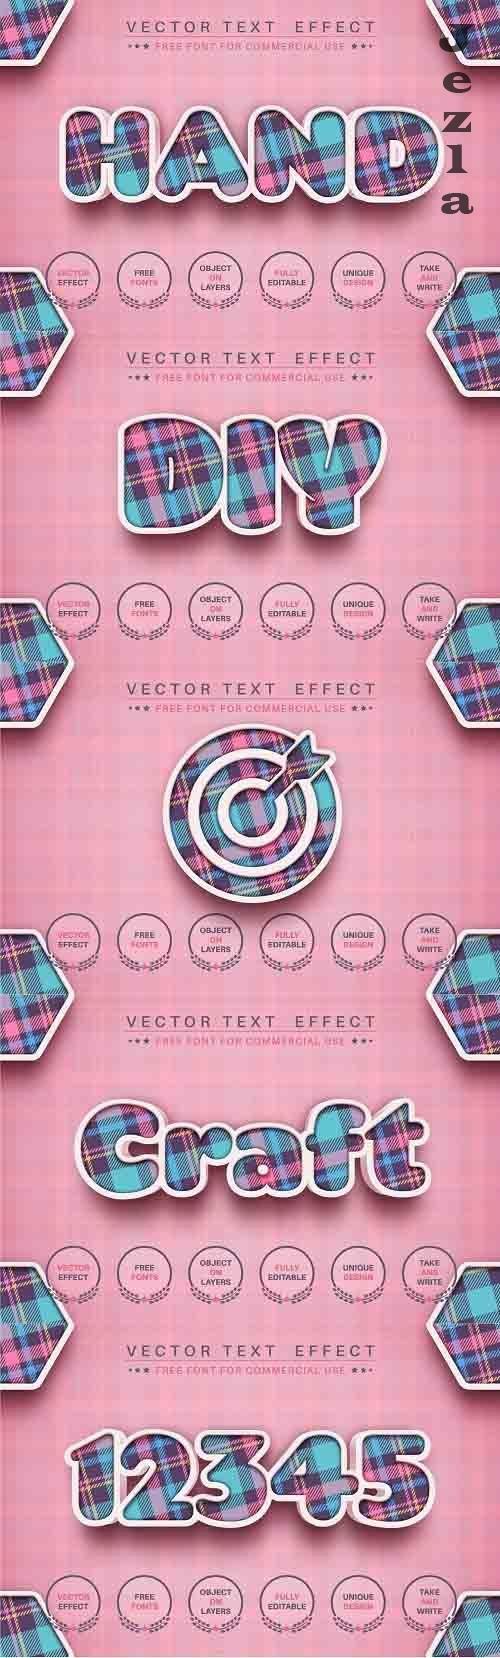 3D craft - editable text effect - 6126350